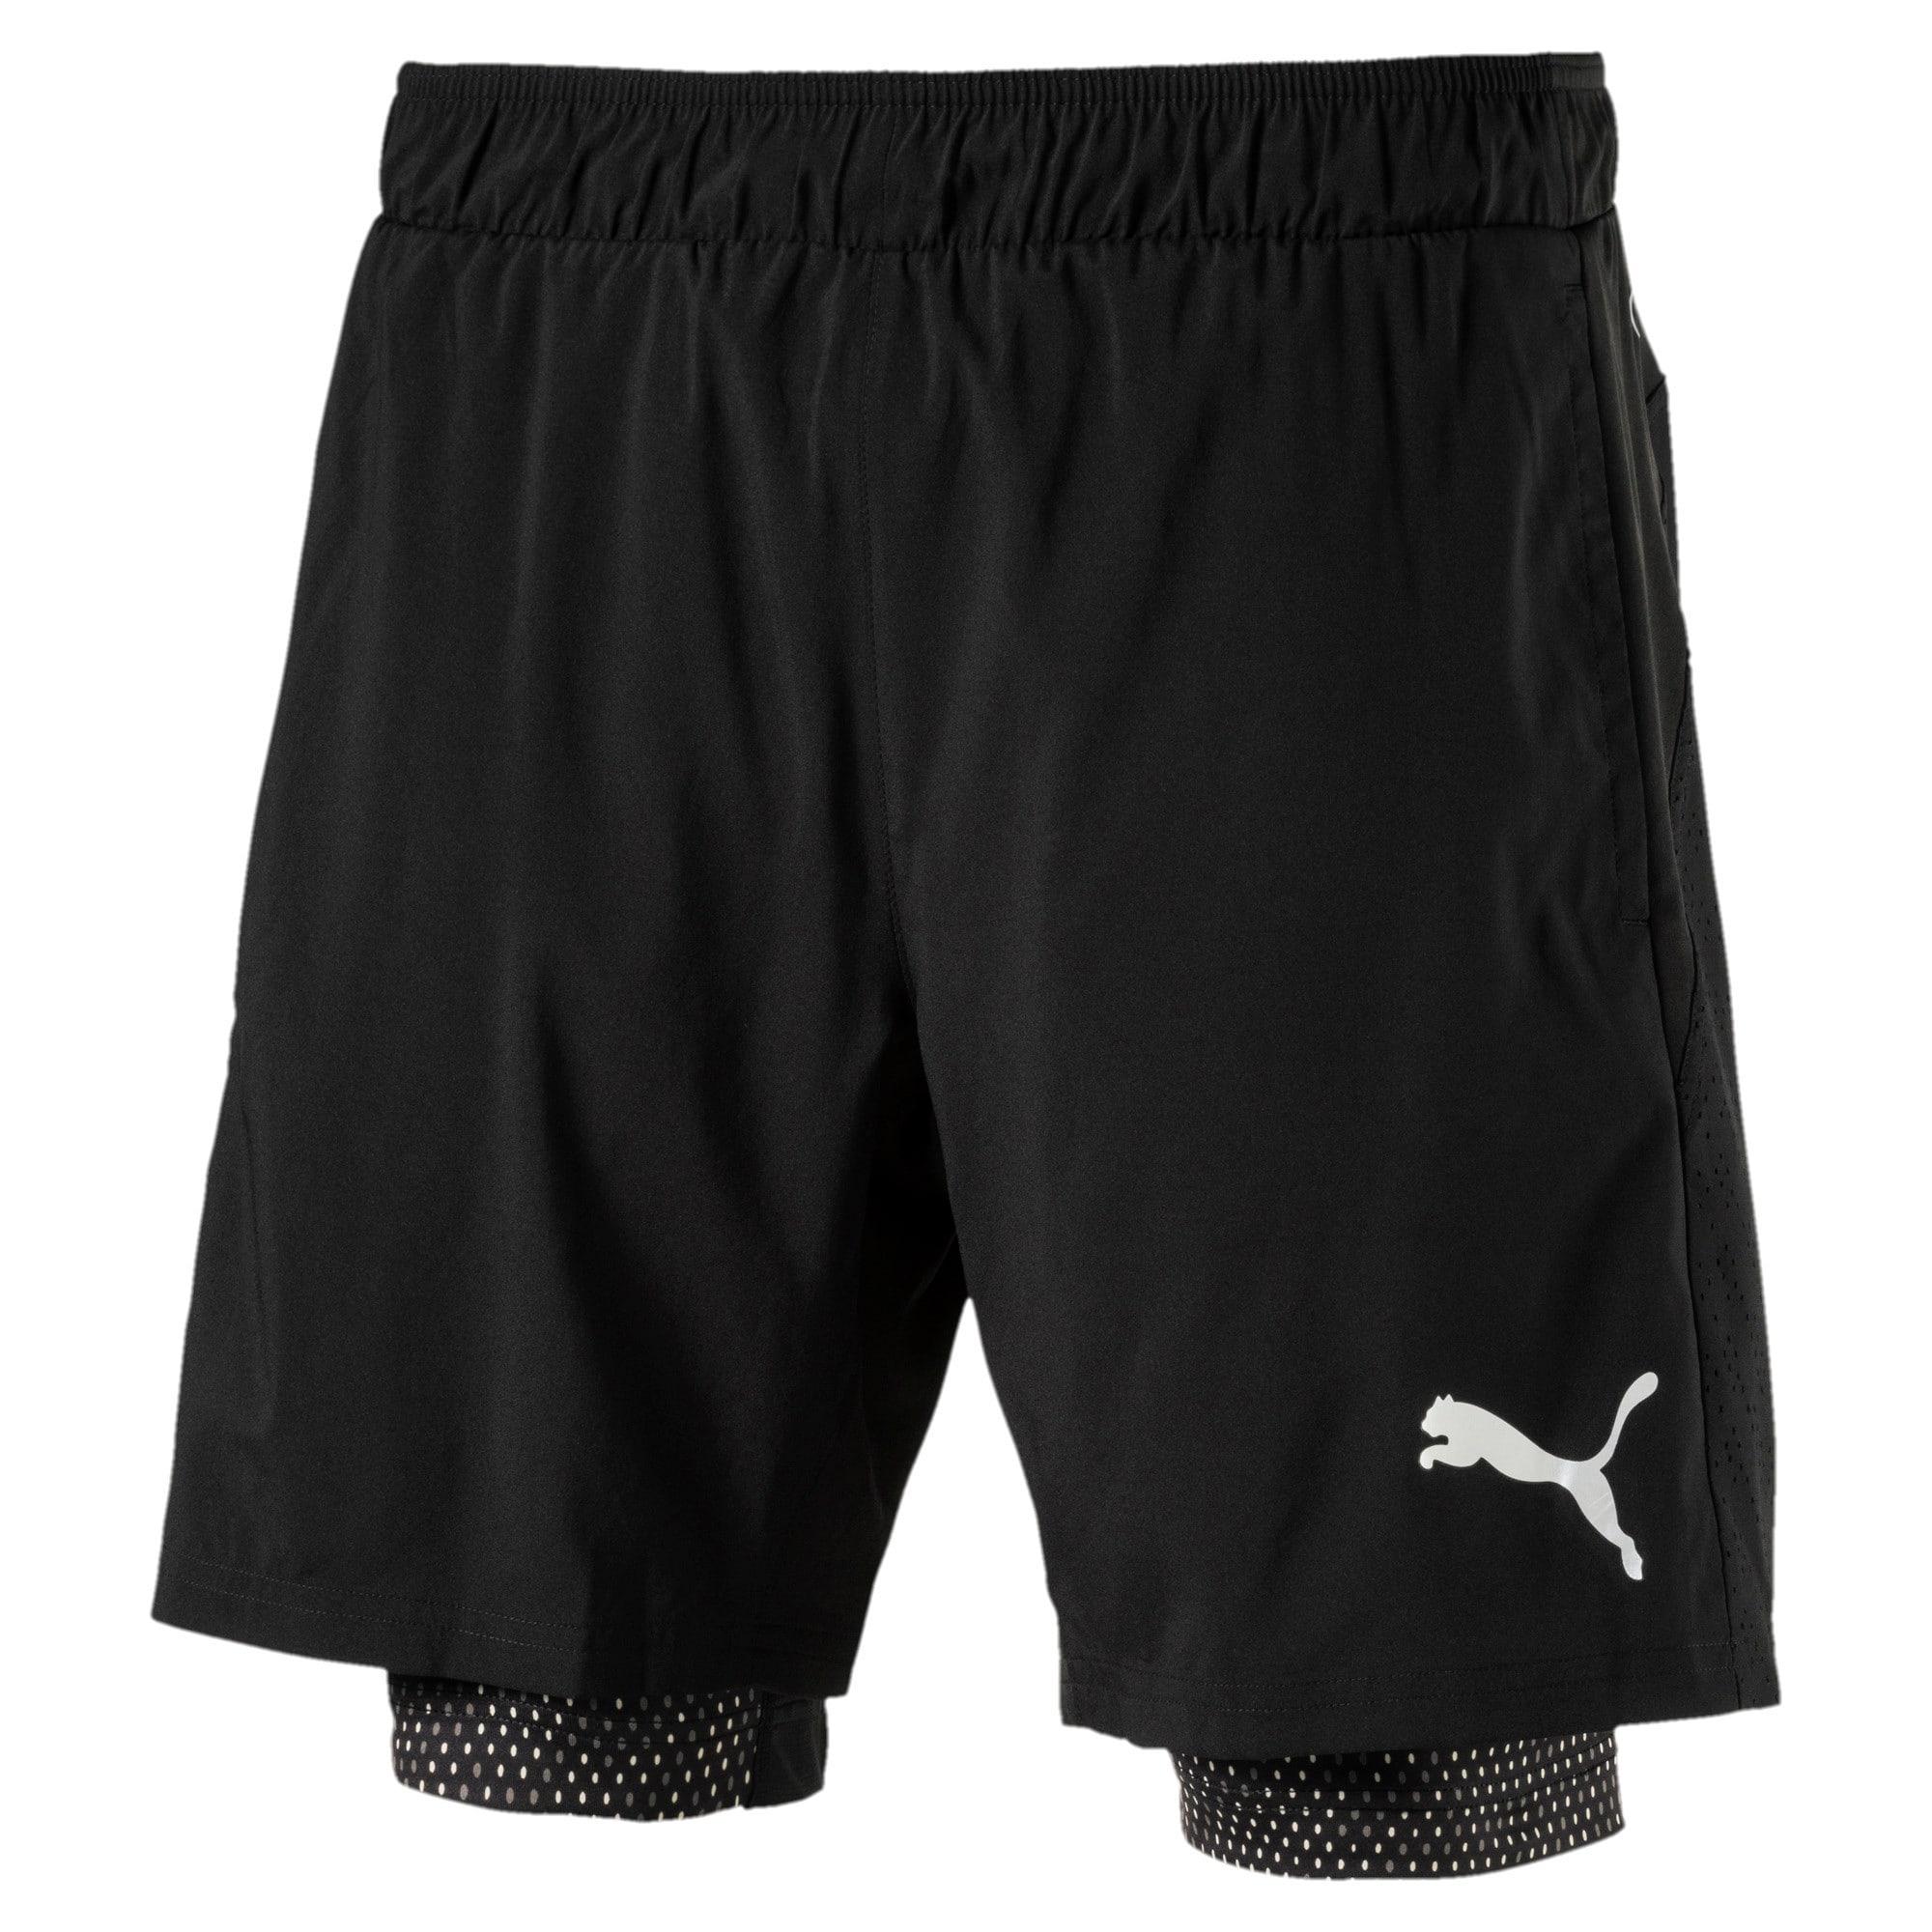 Thumbnail 4 of Active Training Men's 2 in 1 Shorts, Puma Black, medium-IND